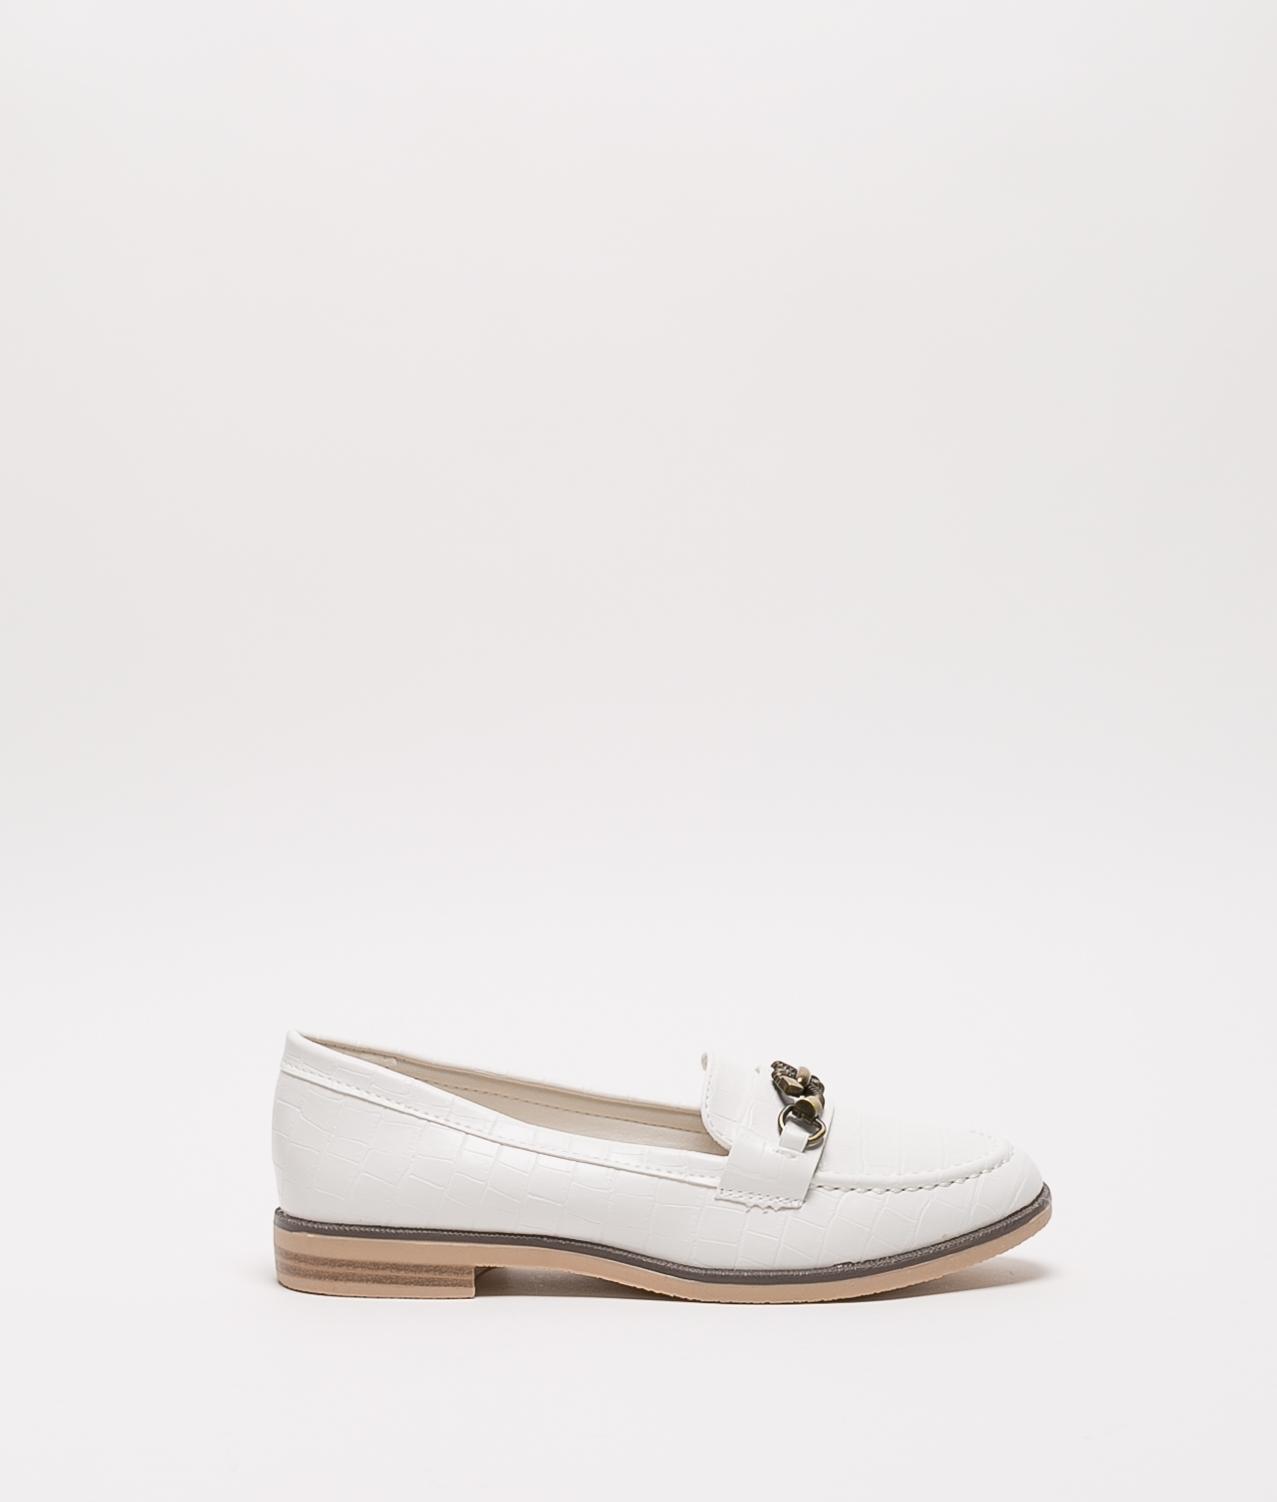 Sapato OLI - BRANCO